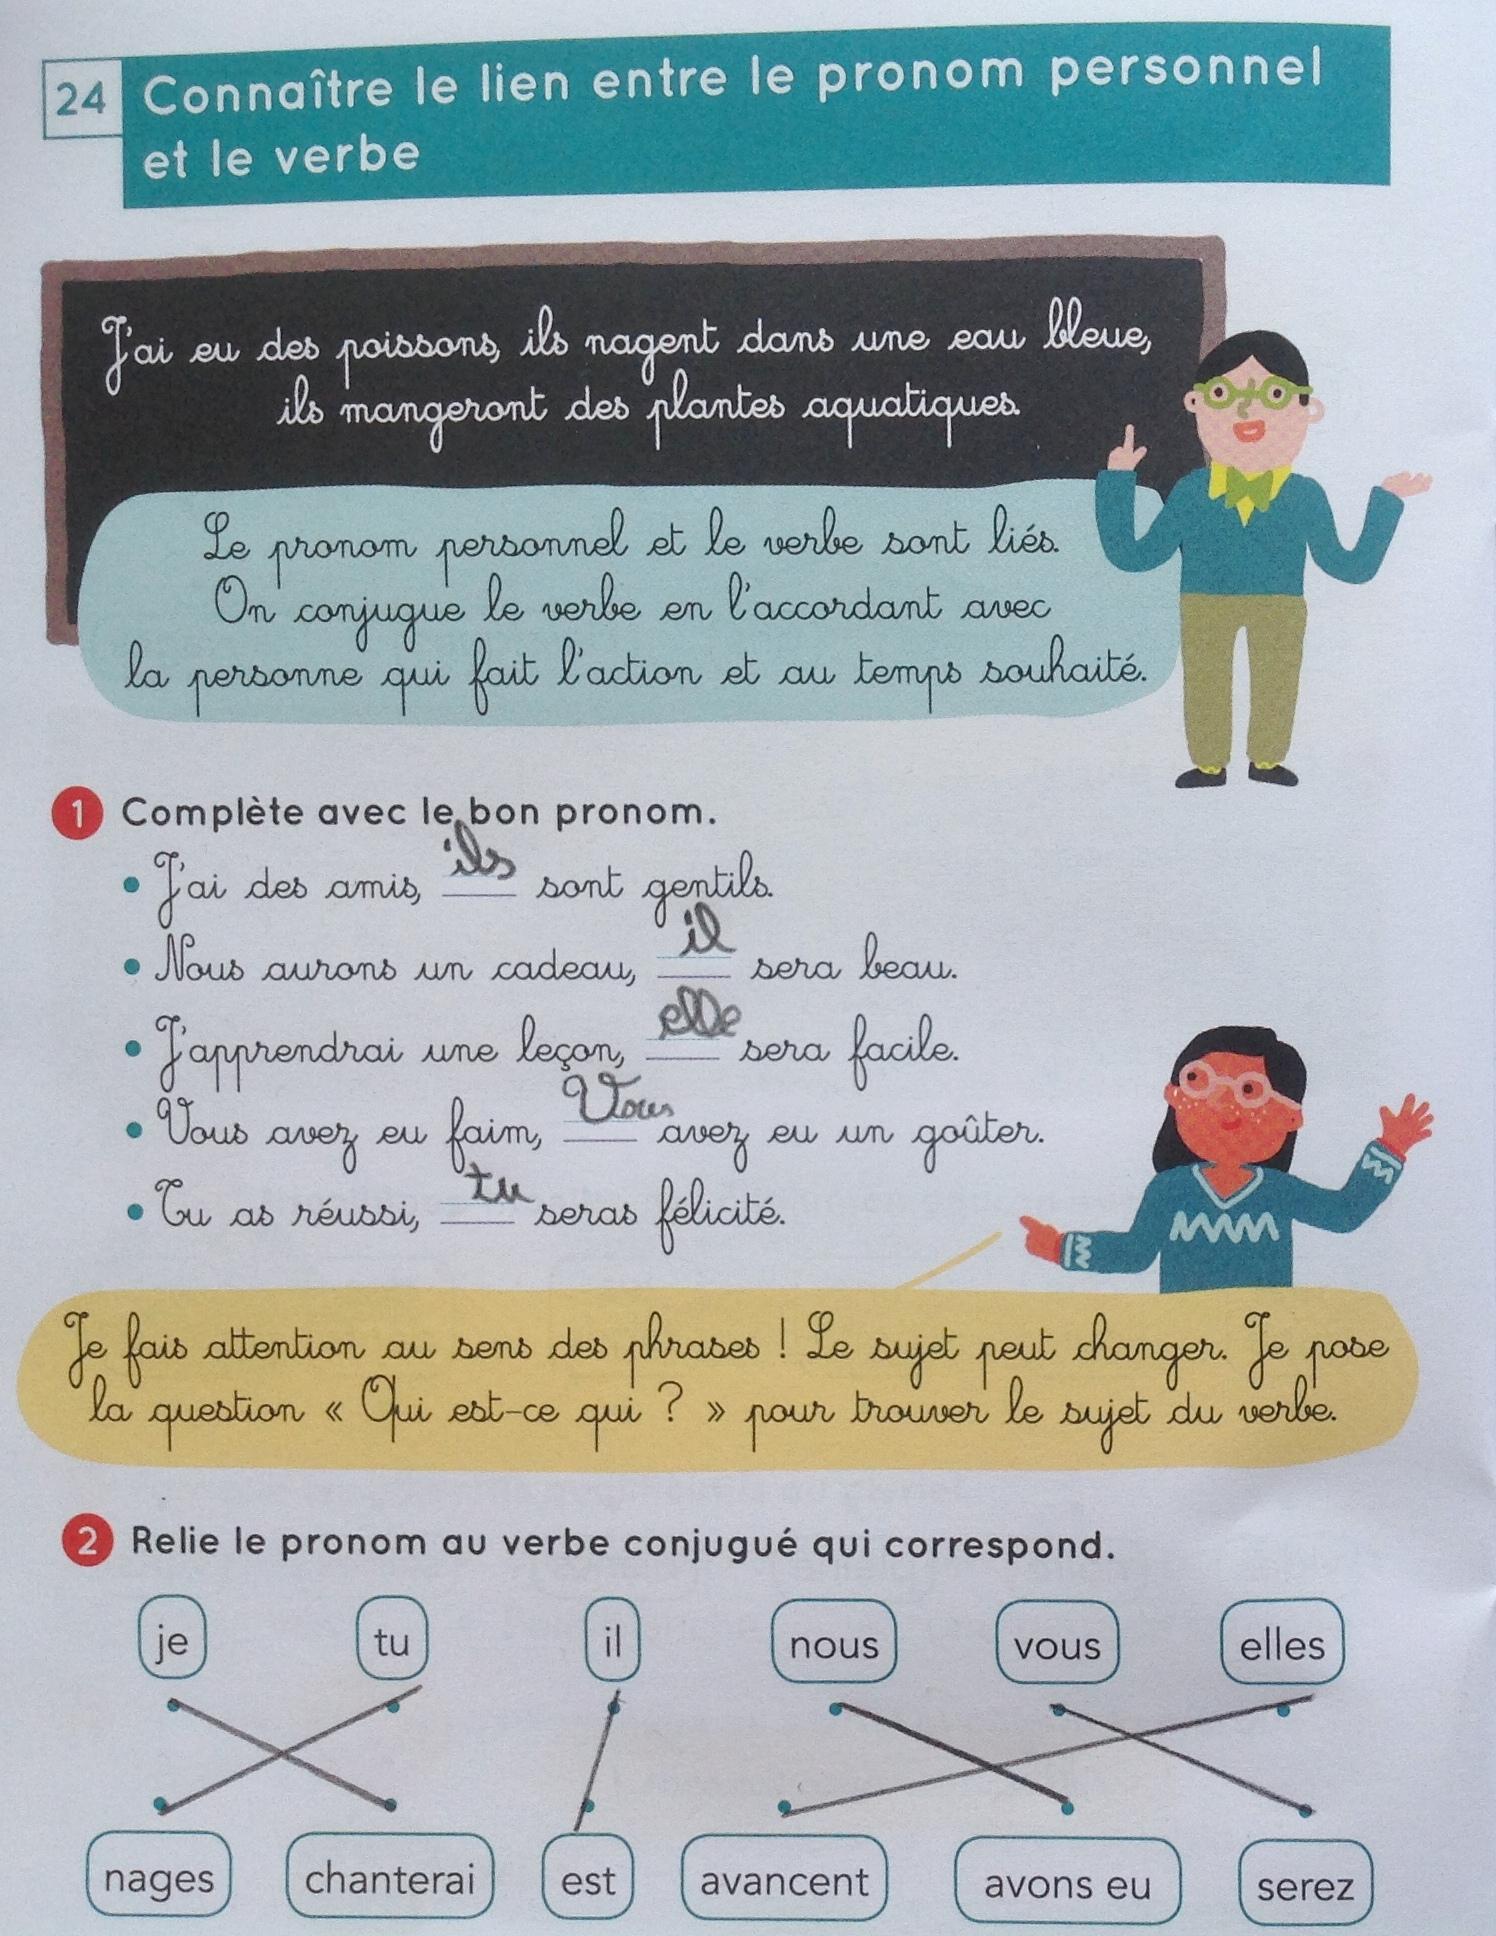 pronom-personnel